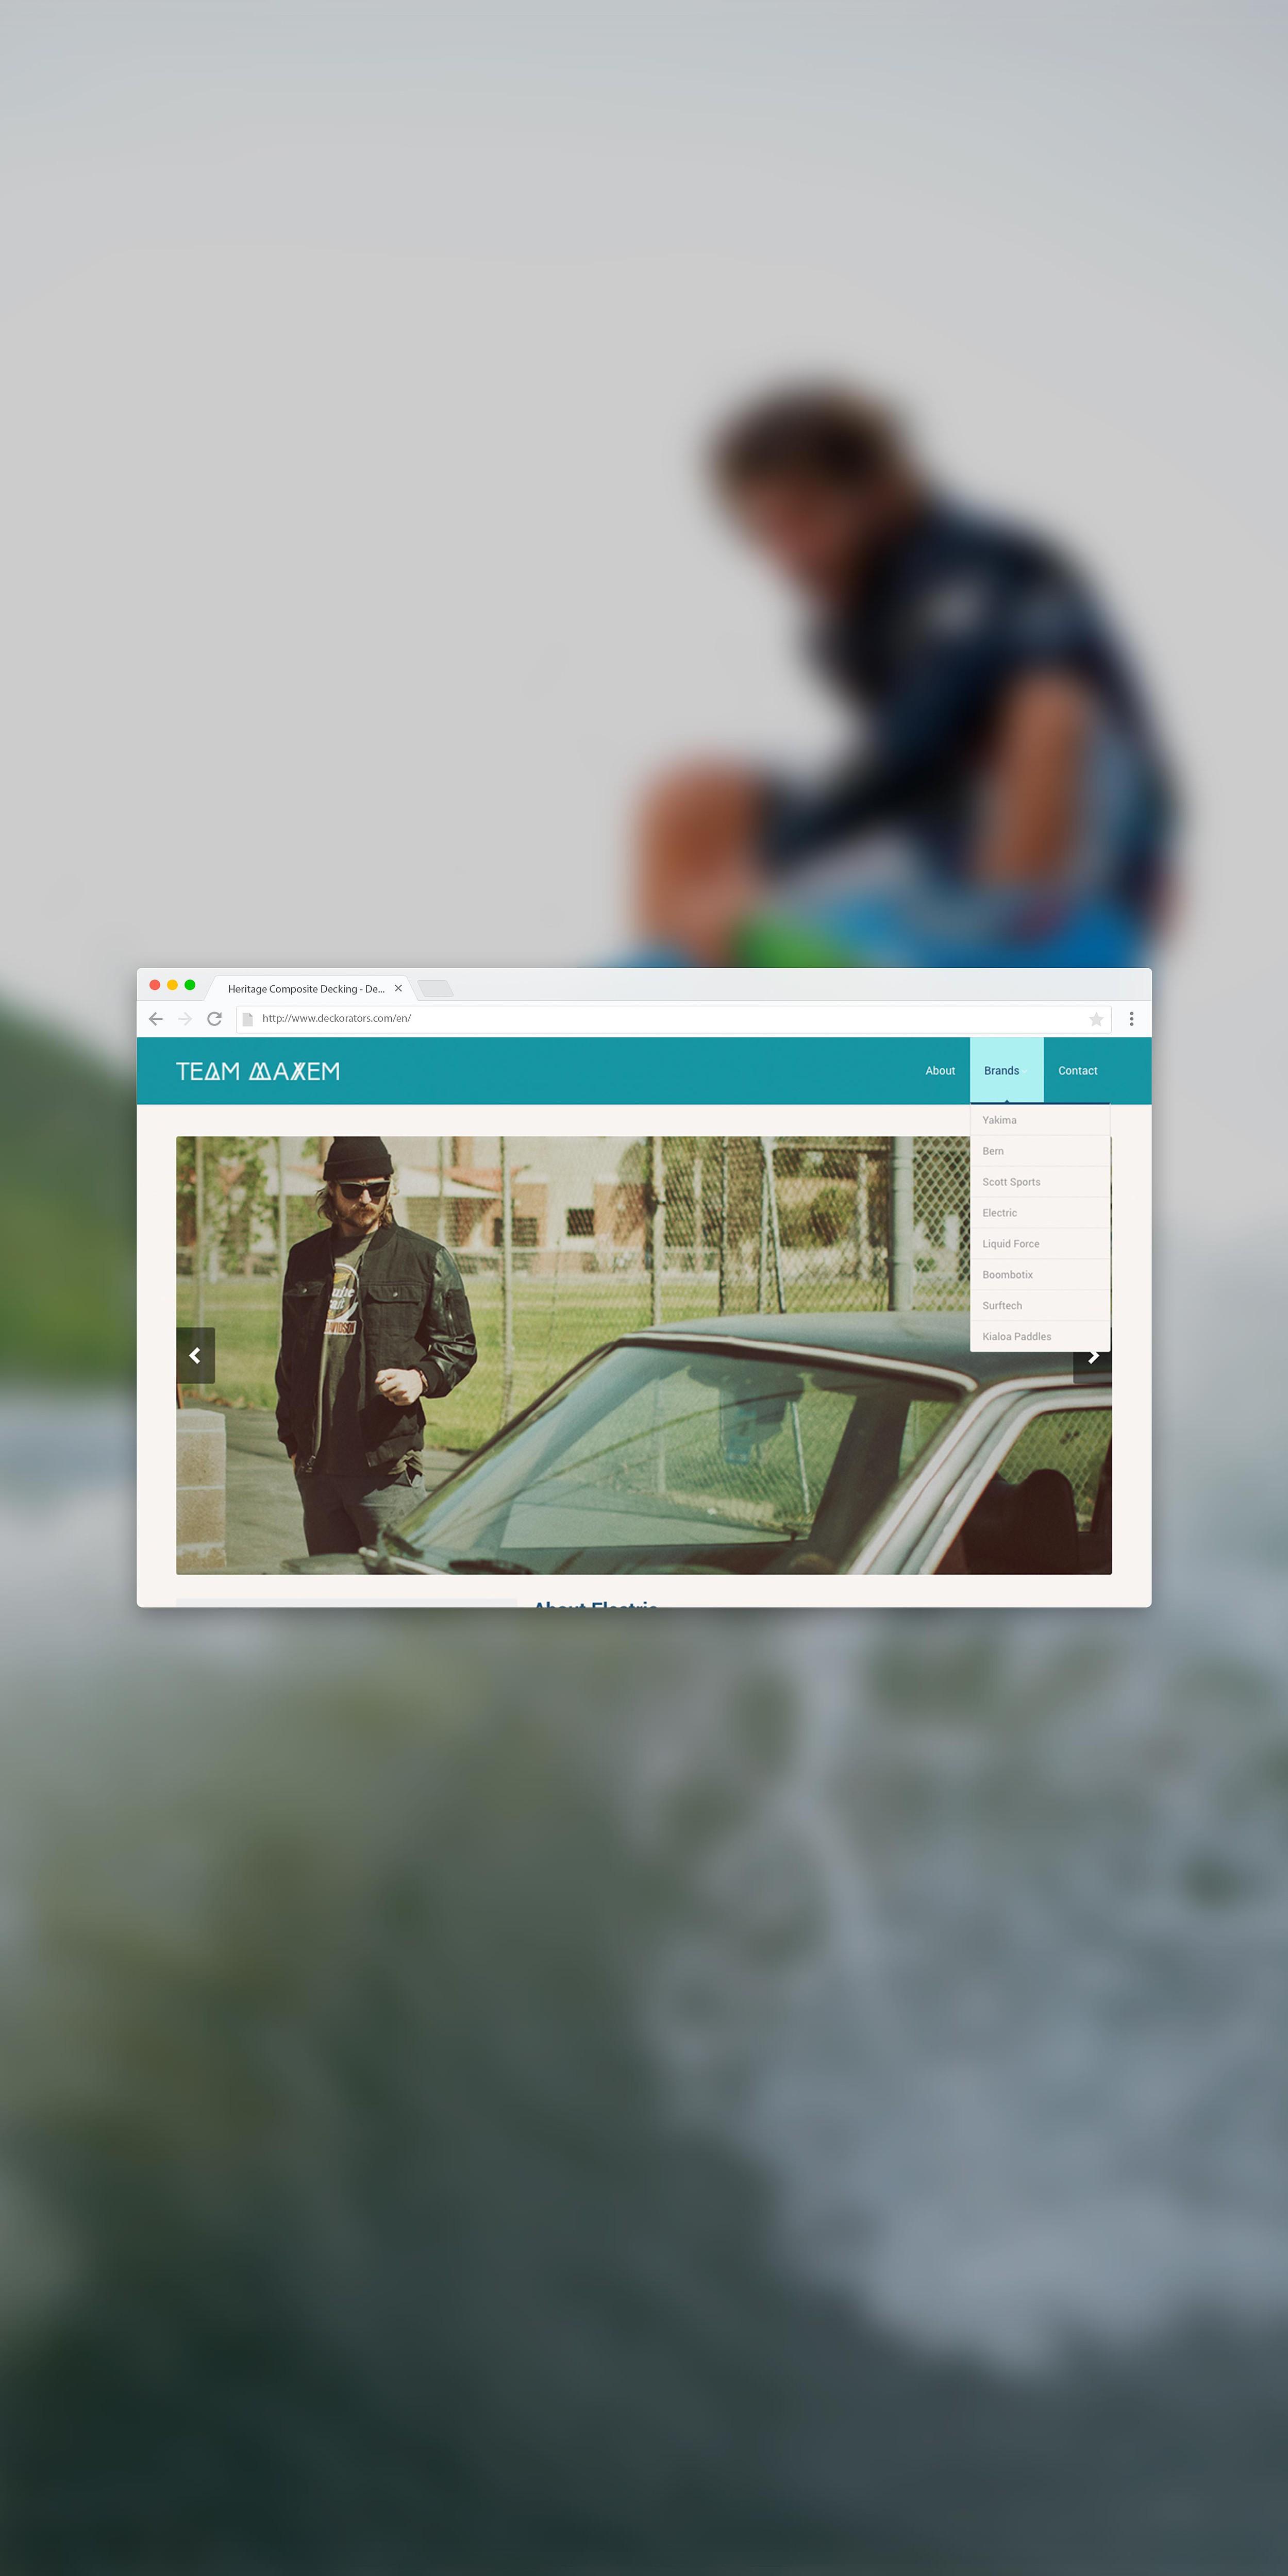 team maxem website on chrome browser